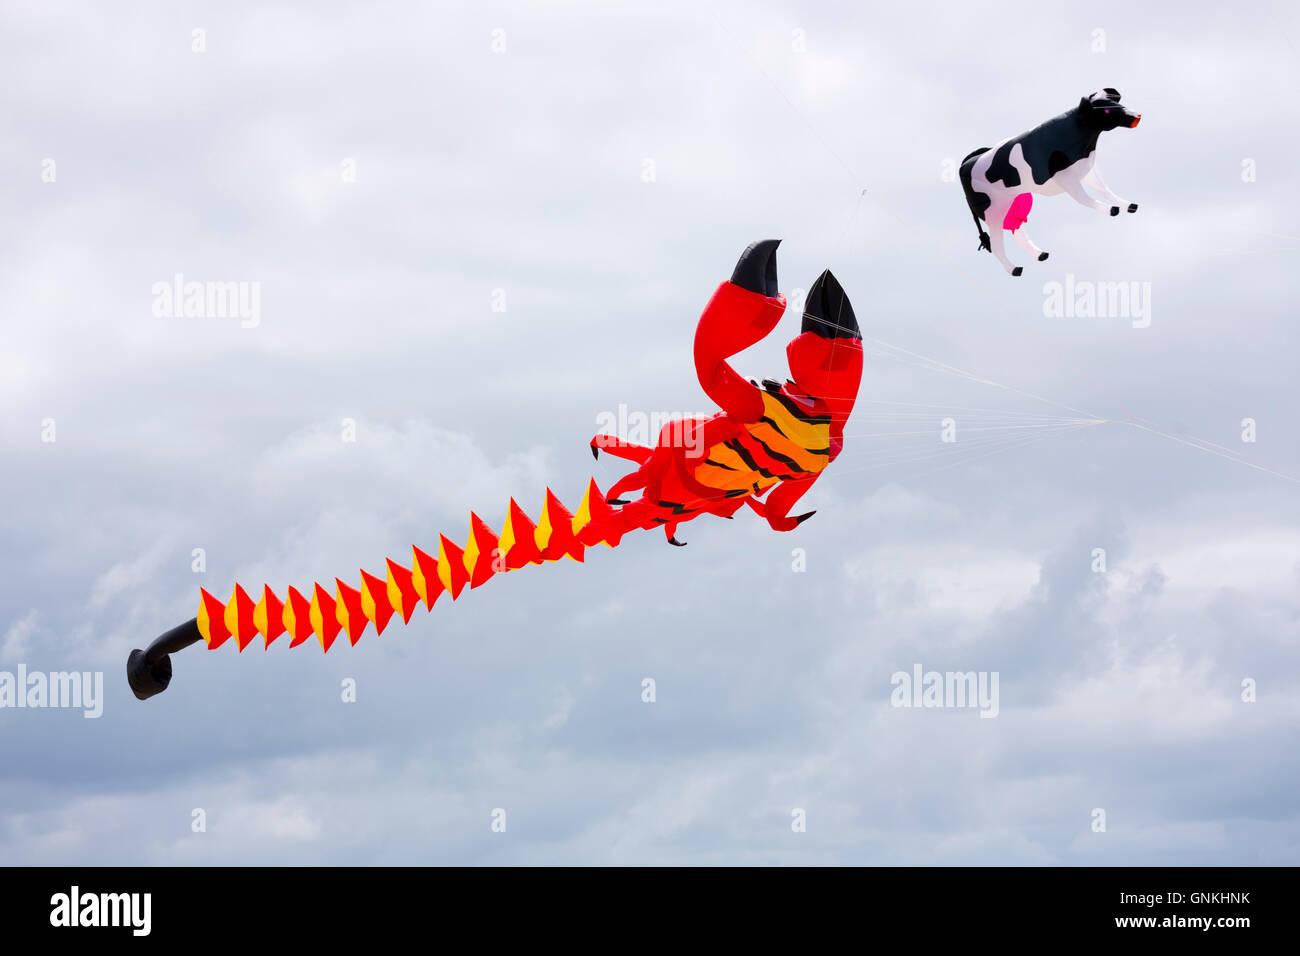 Kite festival of bright color kites and lobster kite in the sky above Fano Island - Fanoe - South Jutland, Denmark - Stock Image